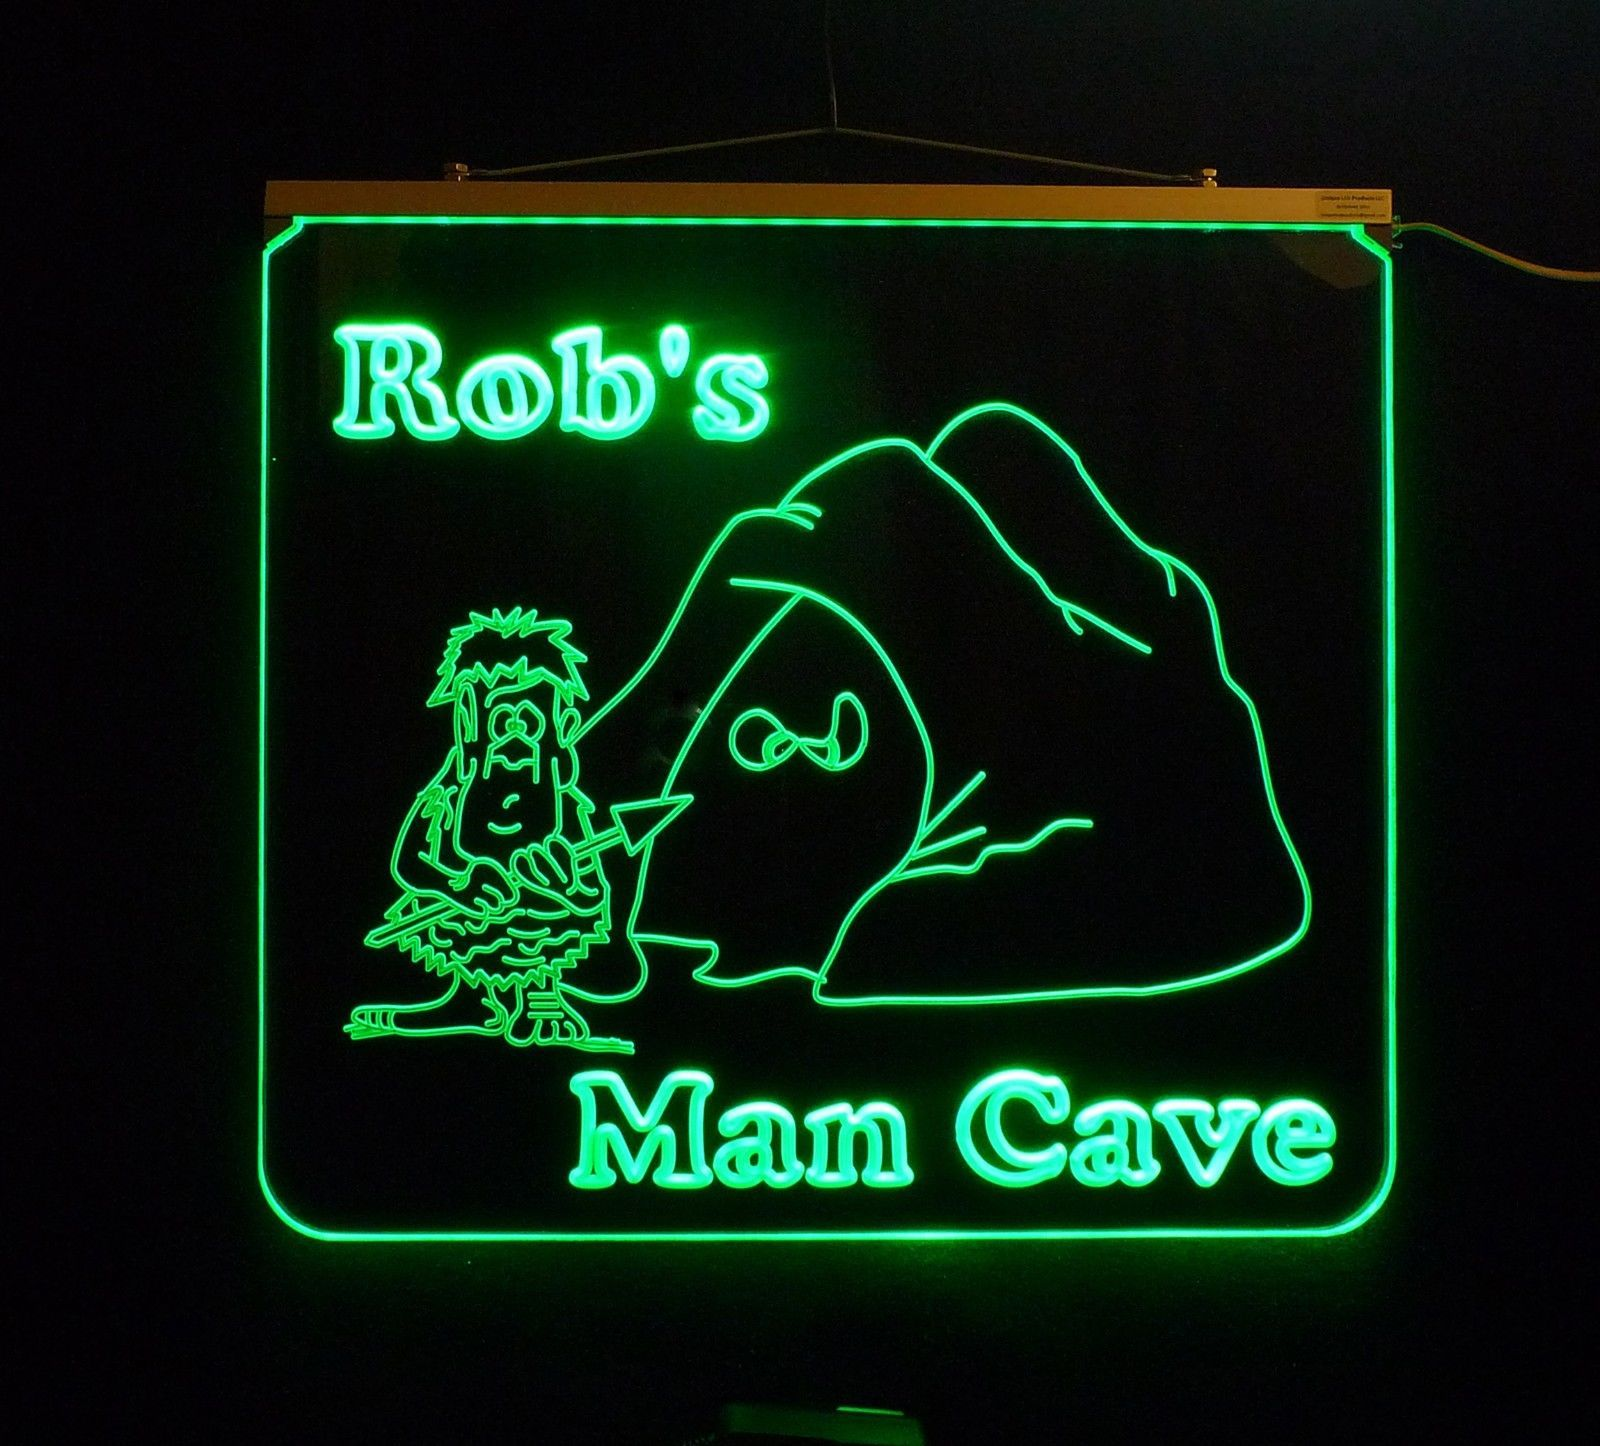 Personalized Man Cave, Garage, Bar, LED Custom Sign image 3